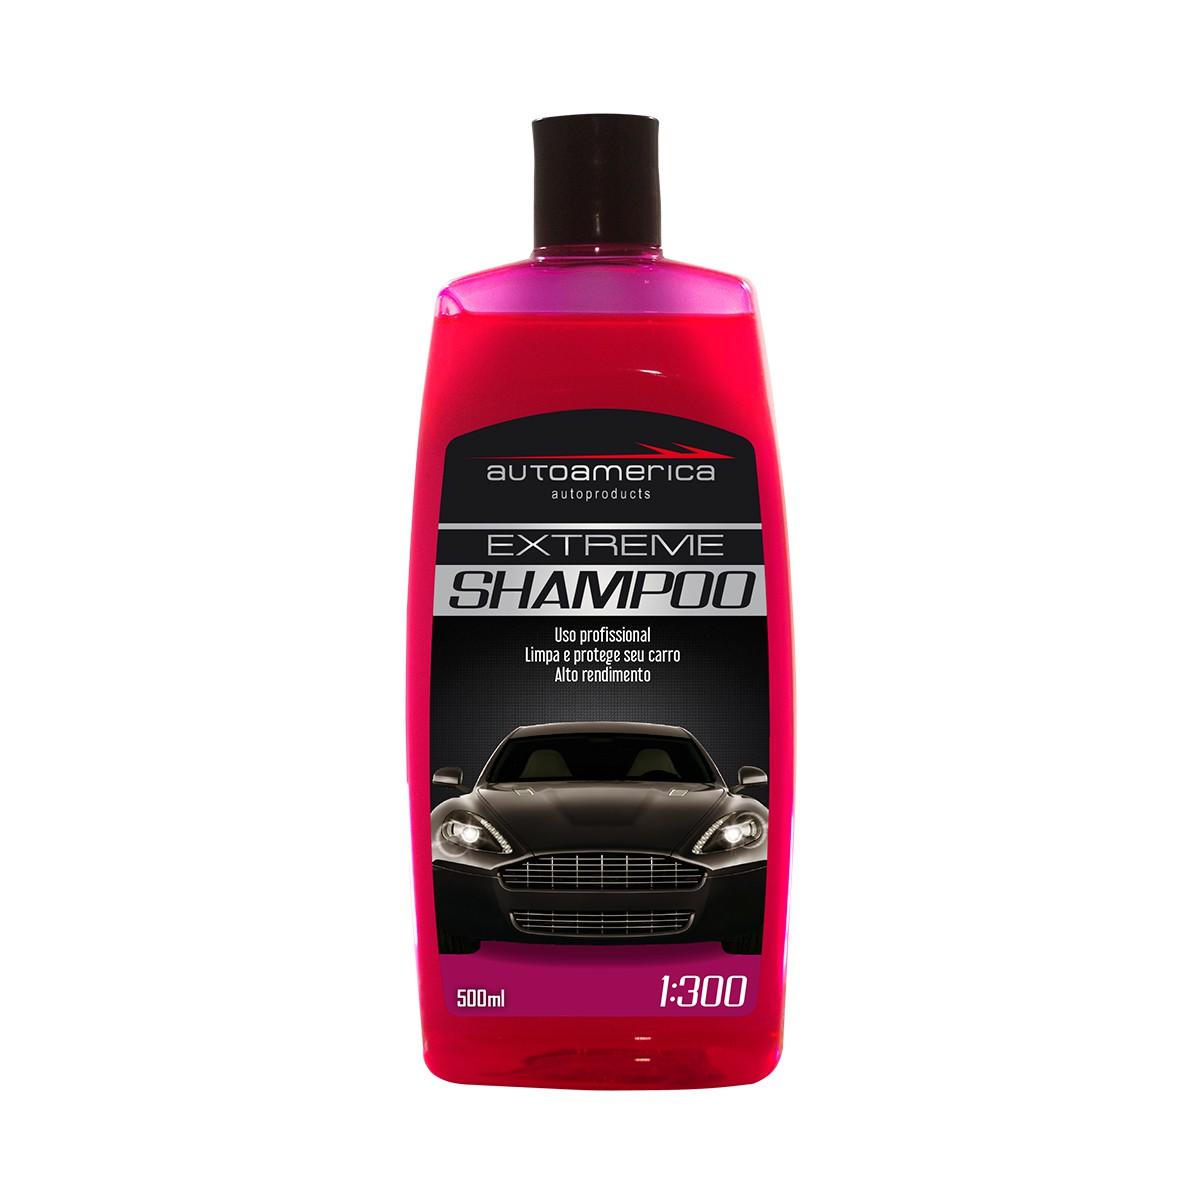 Shampoo Extreme 500ml - Autoamerica